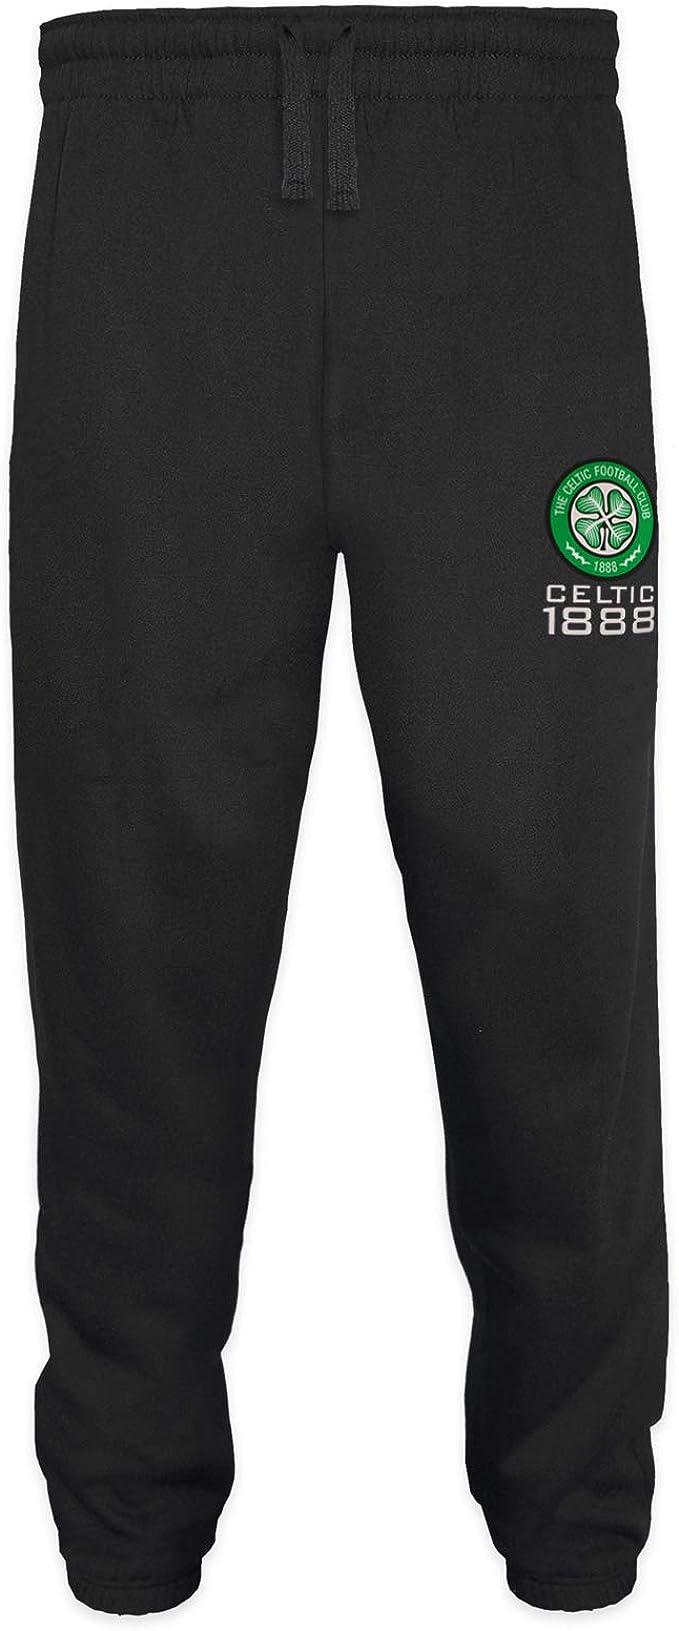 BOYS 4 5 Years CELTIC FC Tracksuit Jog Pants KIDS Football Bottoms Trousers